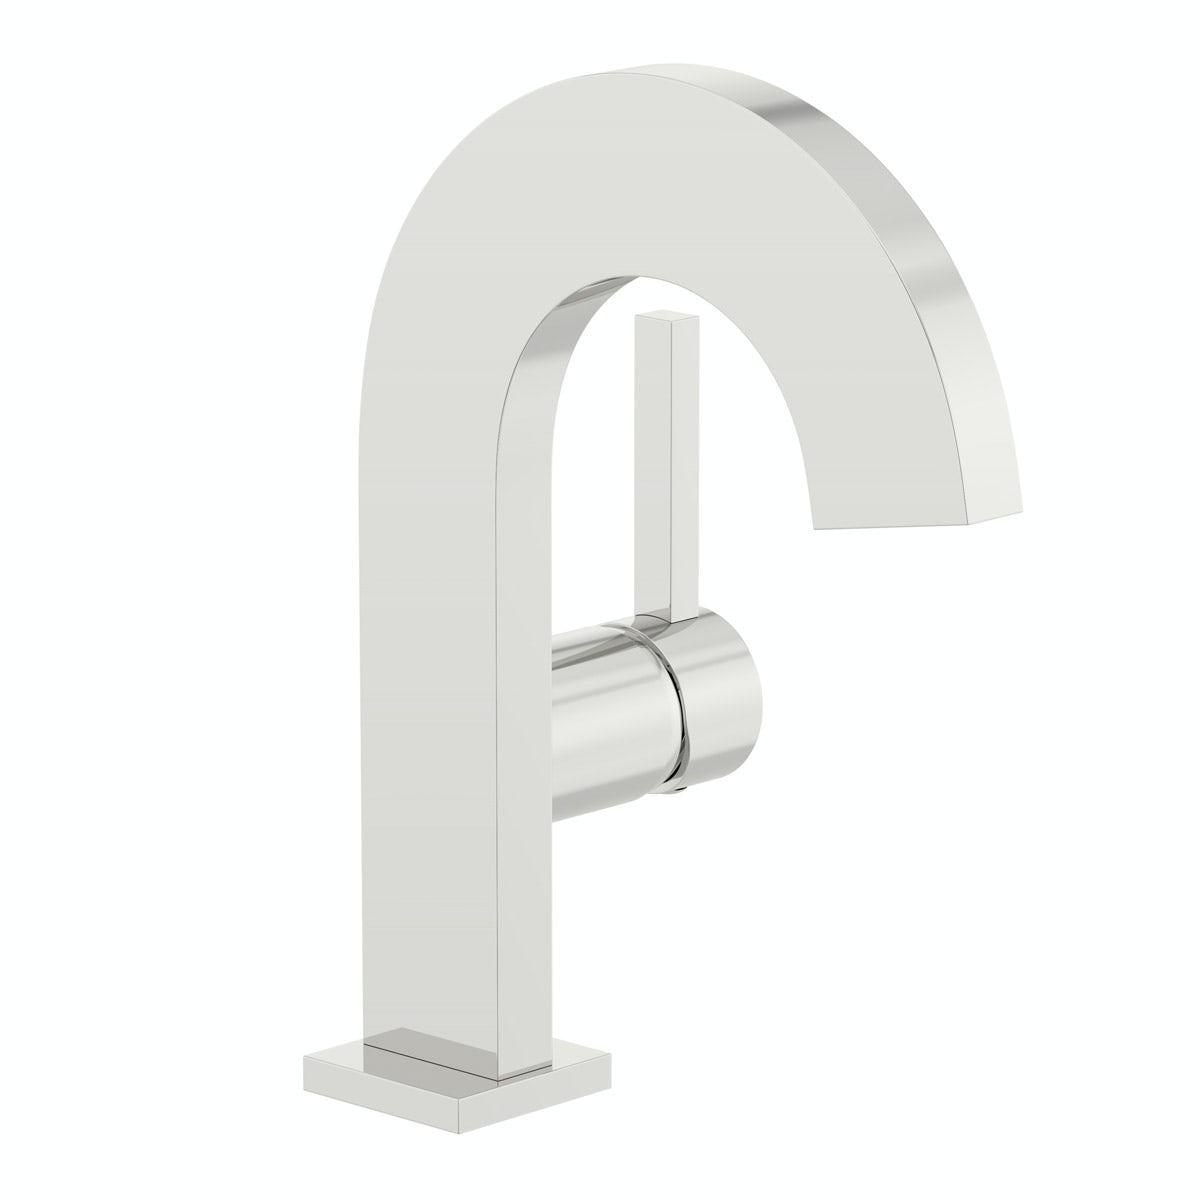 Mode Harrison basin mixer tap